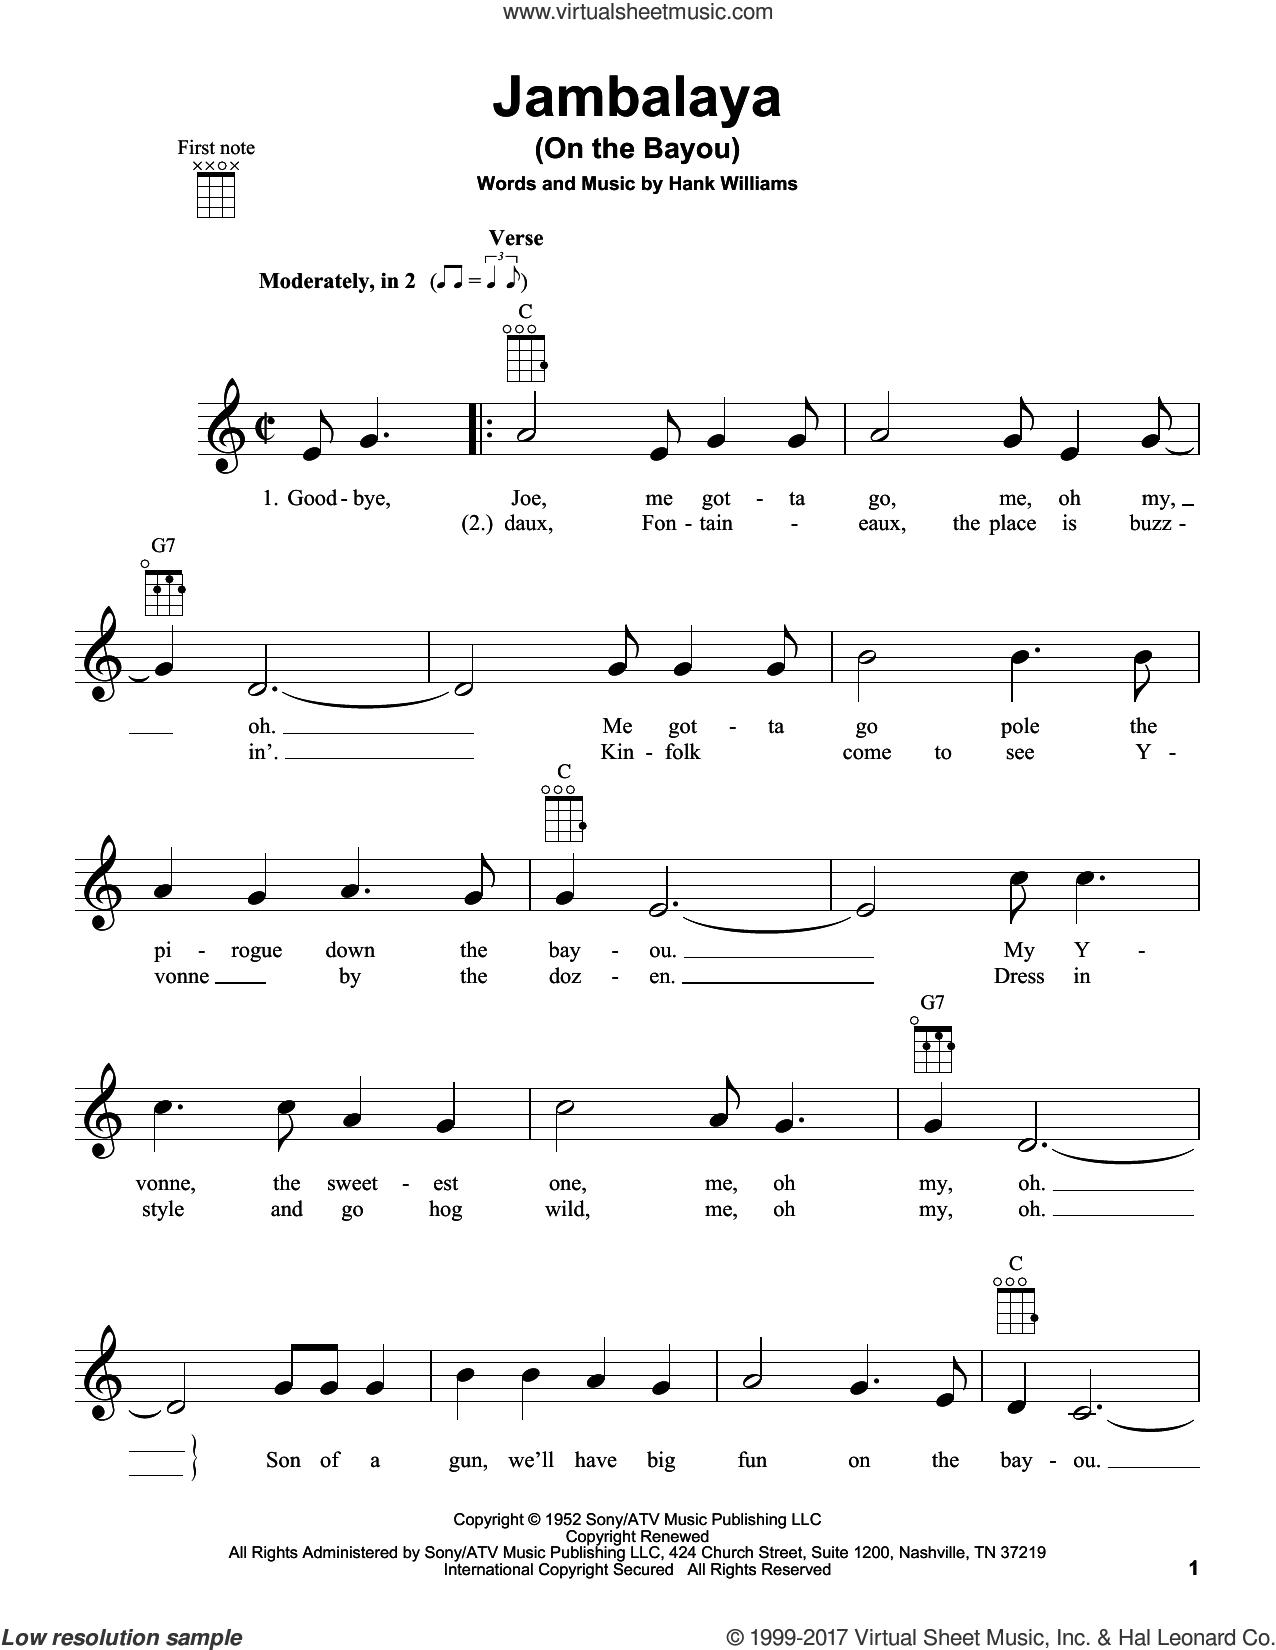 Jambalaya (On The Bayou) sheet music for ukulele by Hank Williams, intermediate skill level